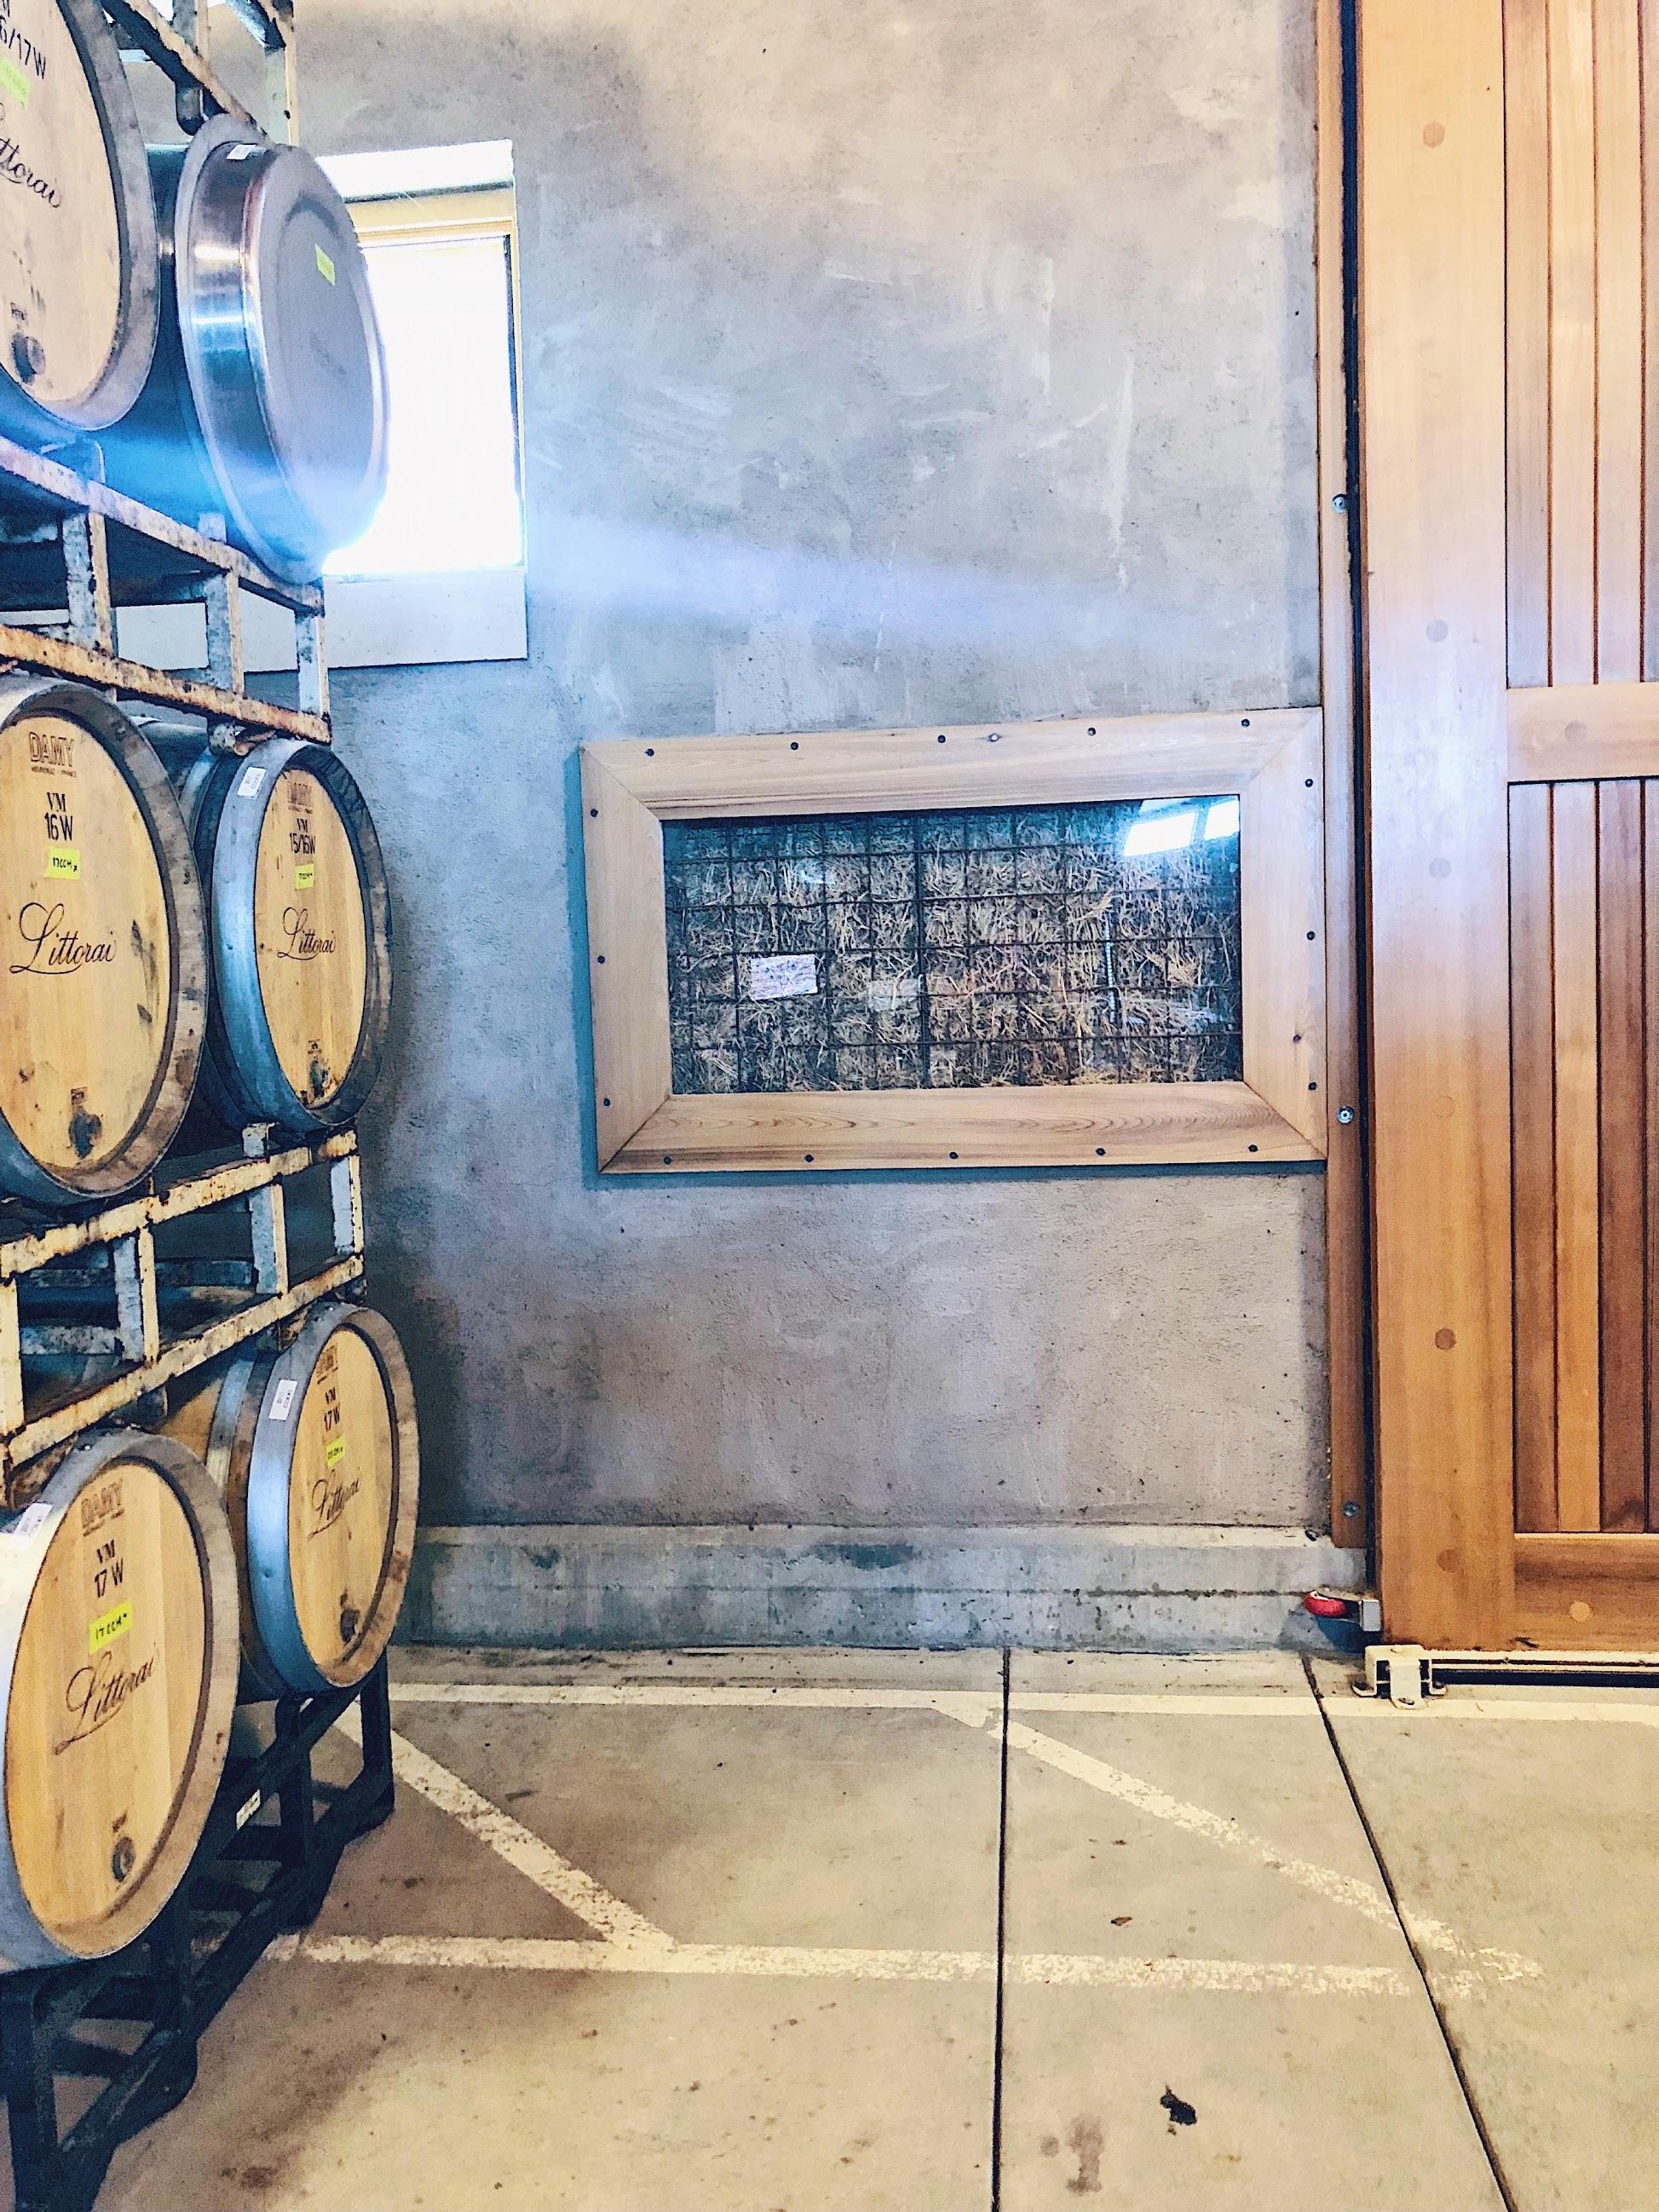 Littorai Winery Wine Barrels